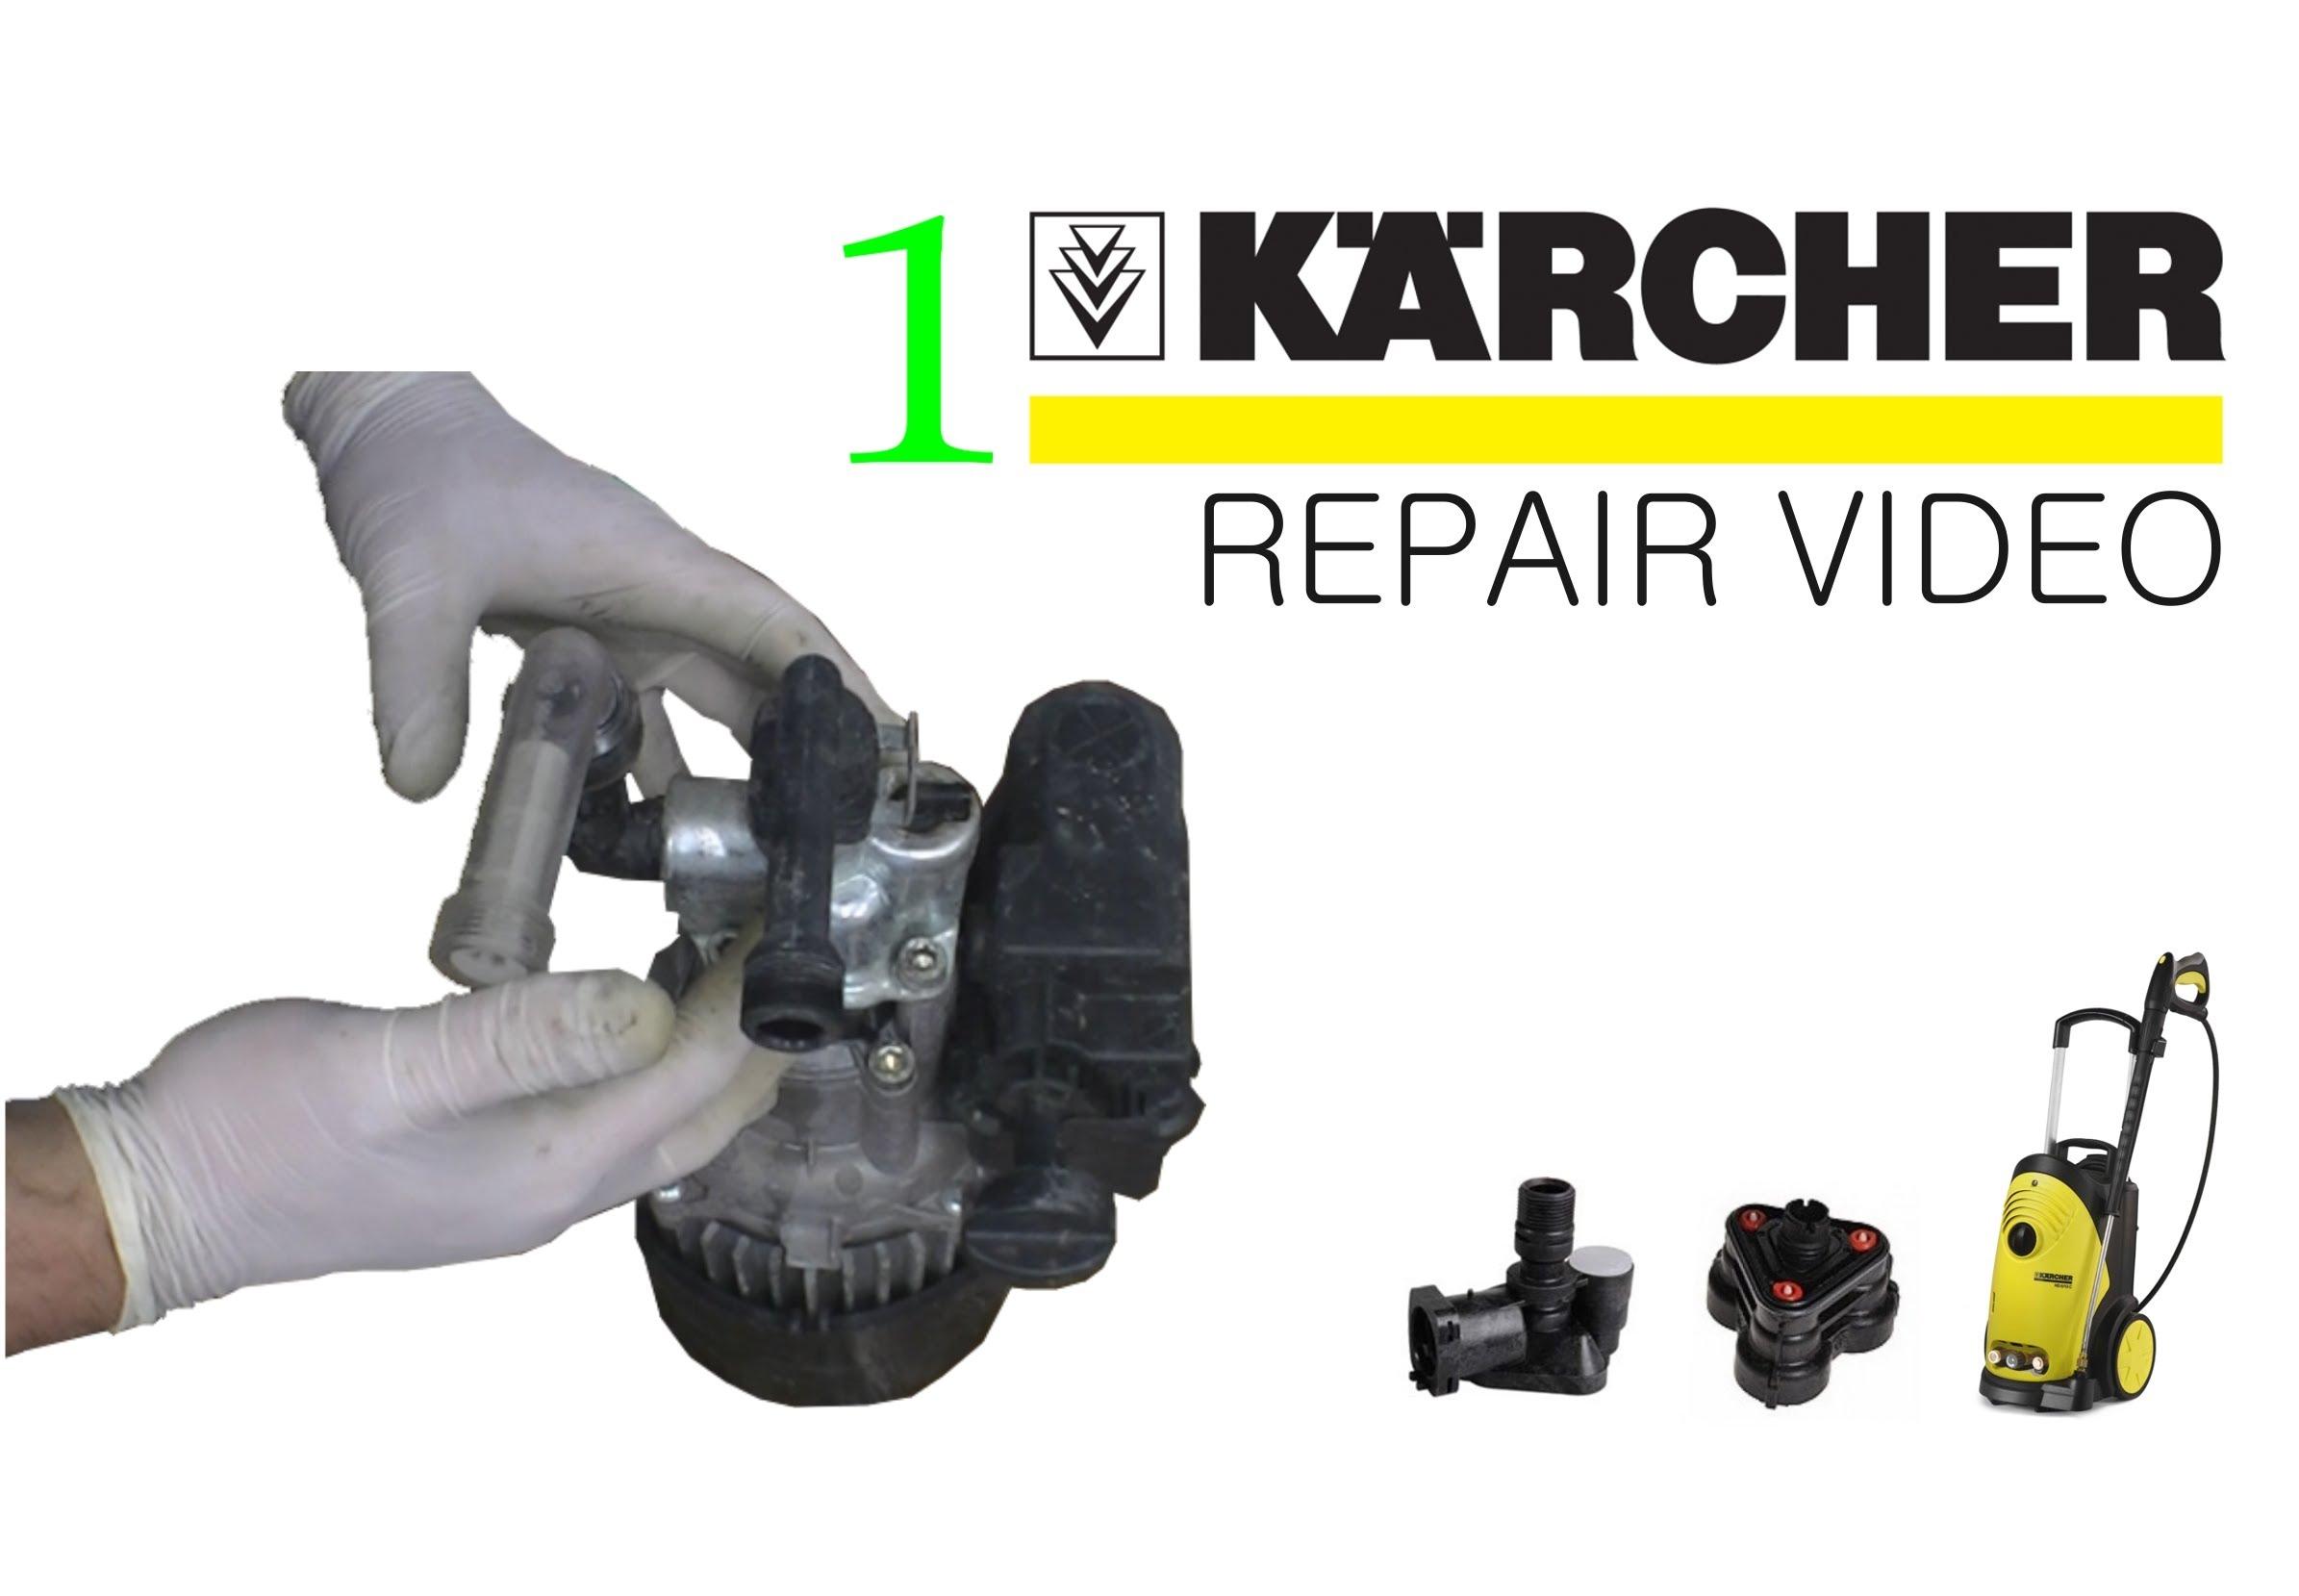 kit reparation karcher